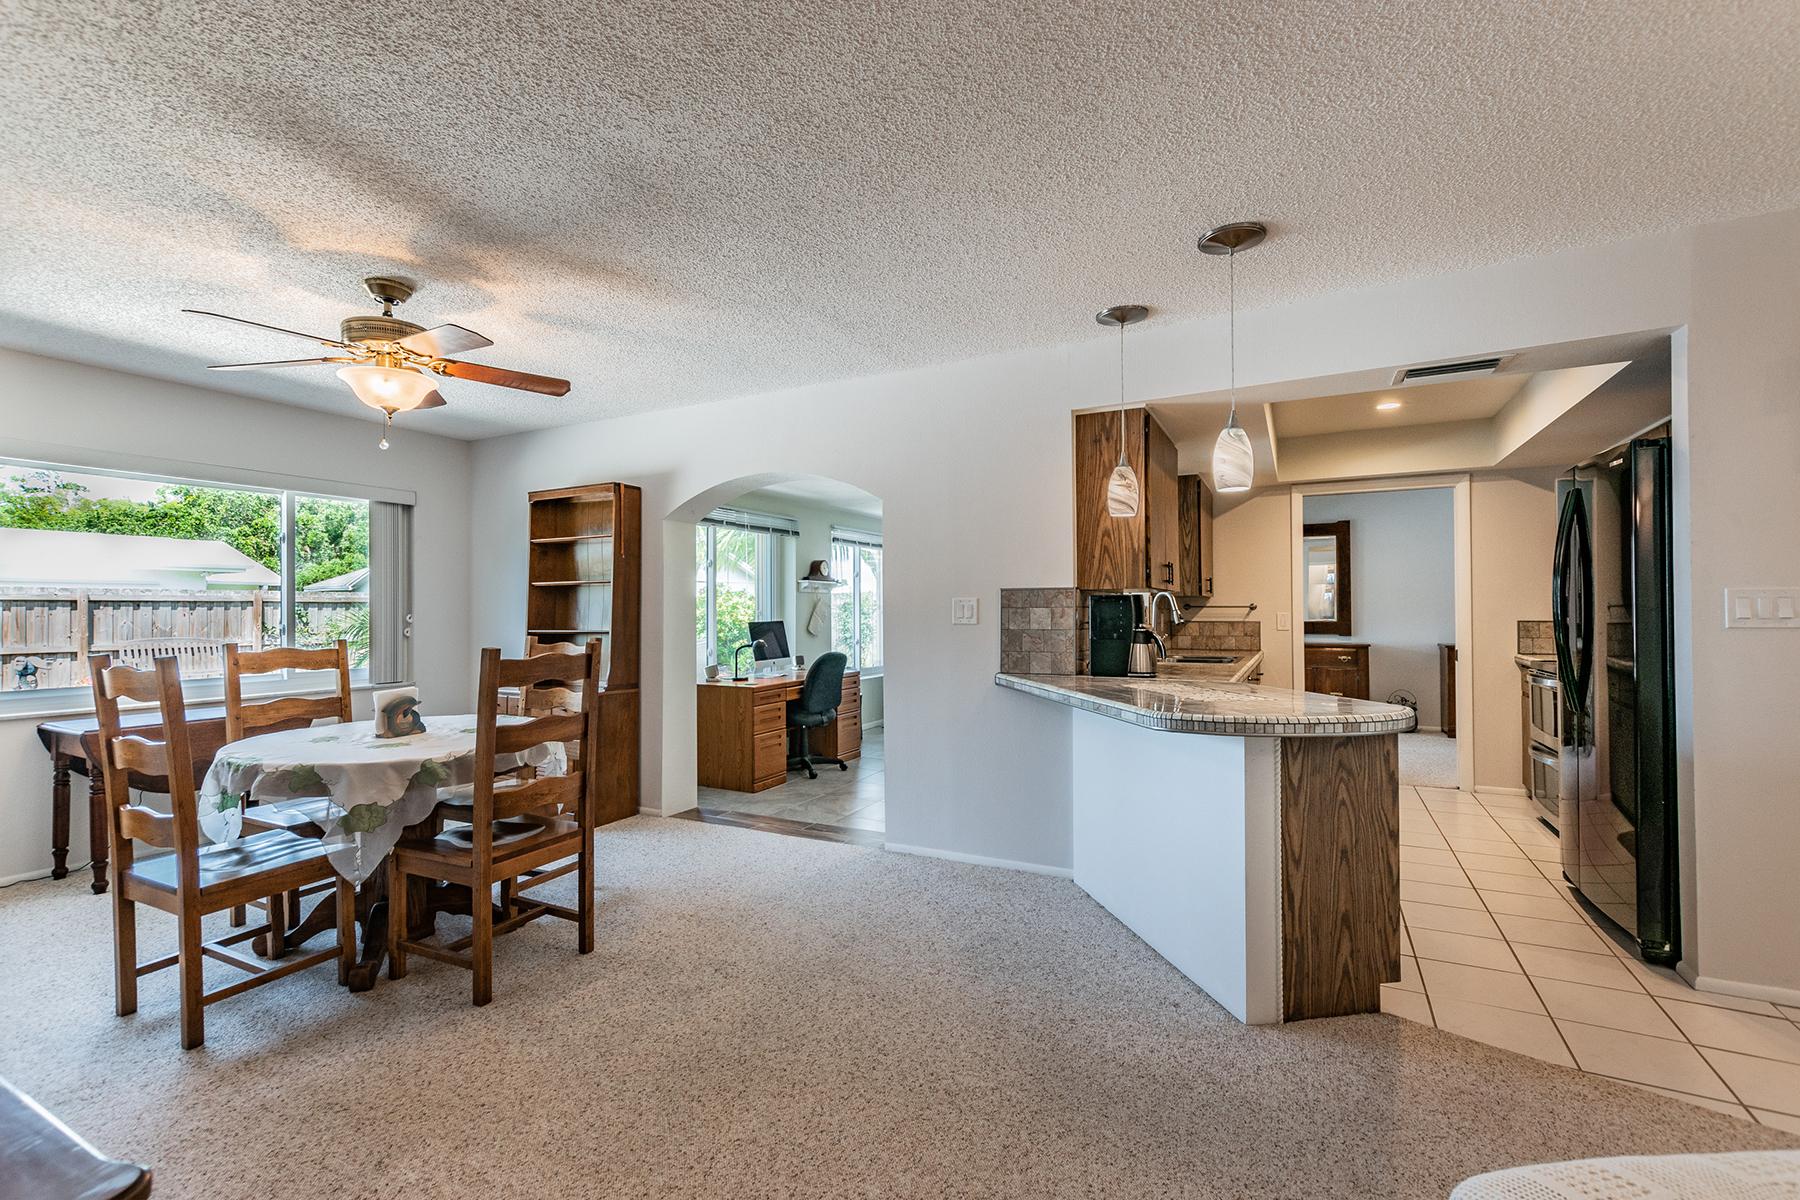 single family homes for Active at SEMINOLE 11167 90th Ter Seminole, Florida 33772 United States